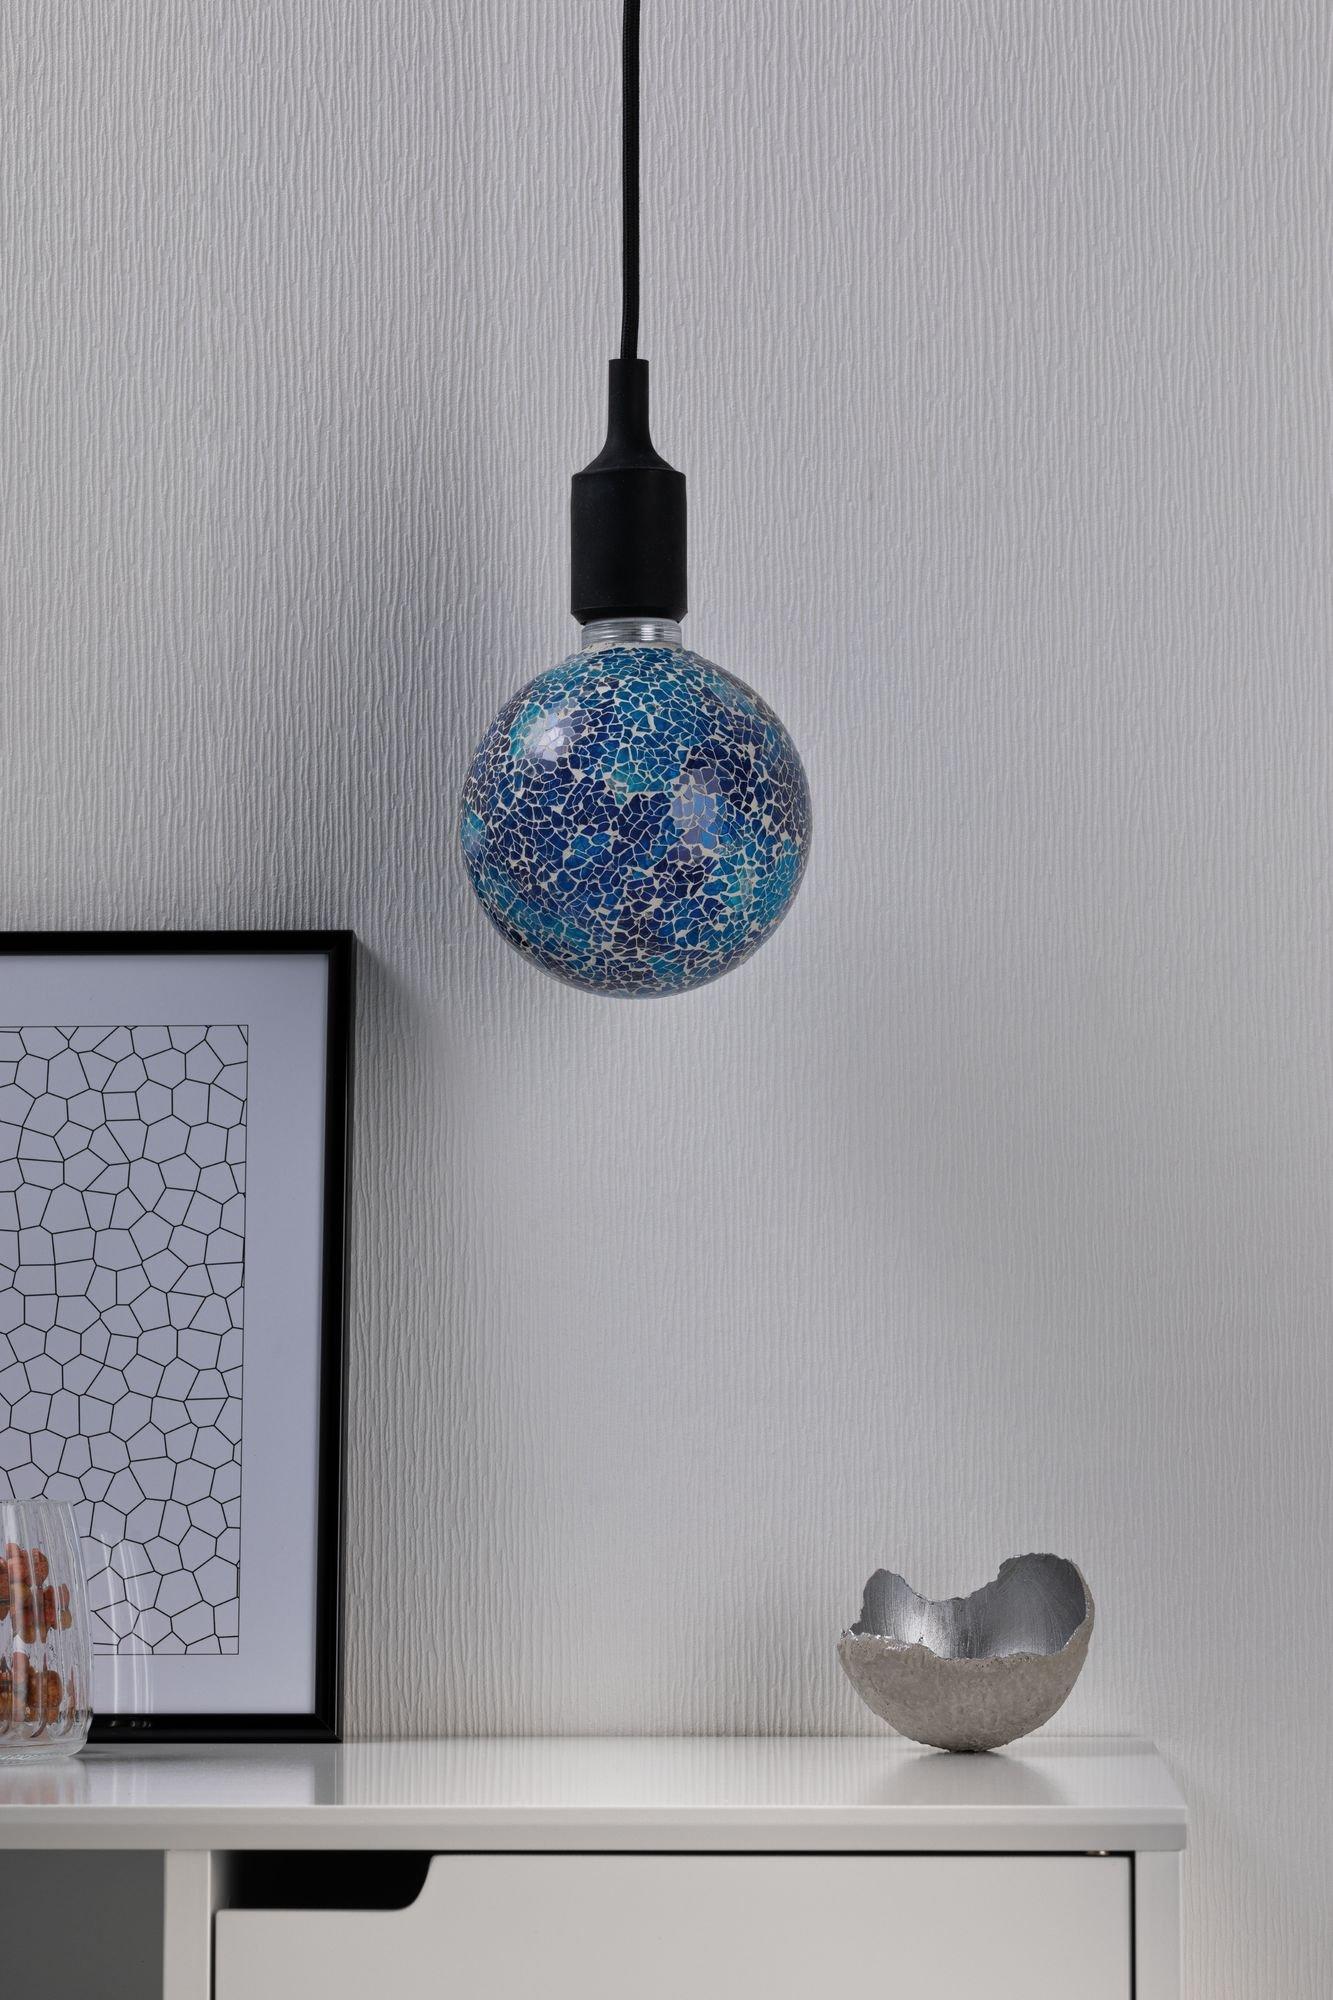 Miracle Mosaic Edition LED Globe E27 230V 470lm 5W 2700K Blau